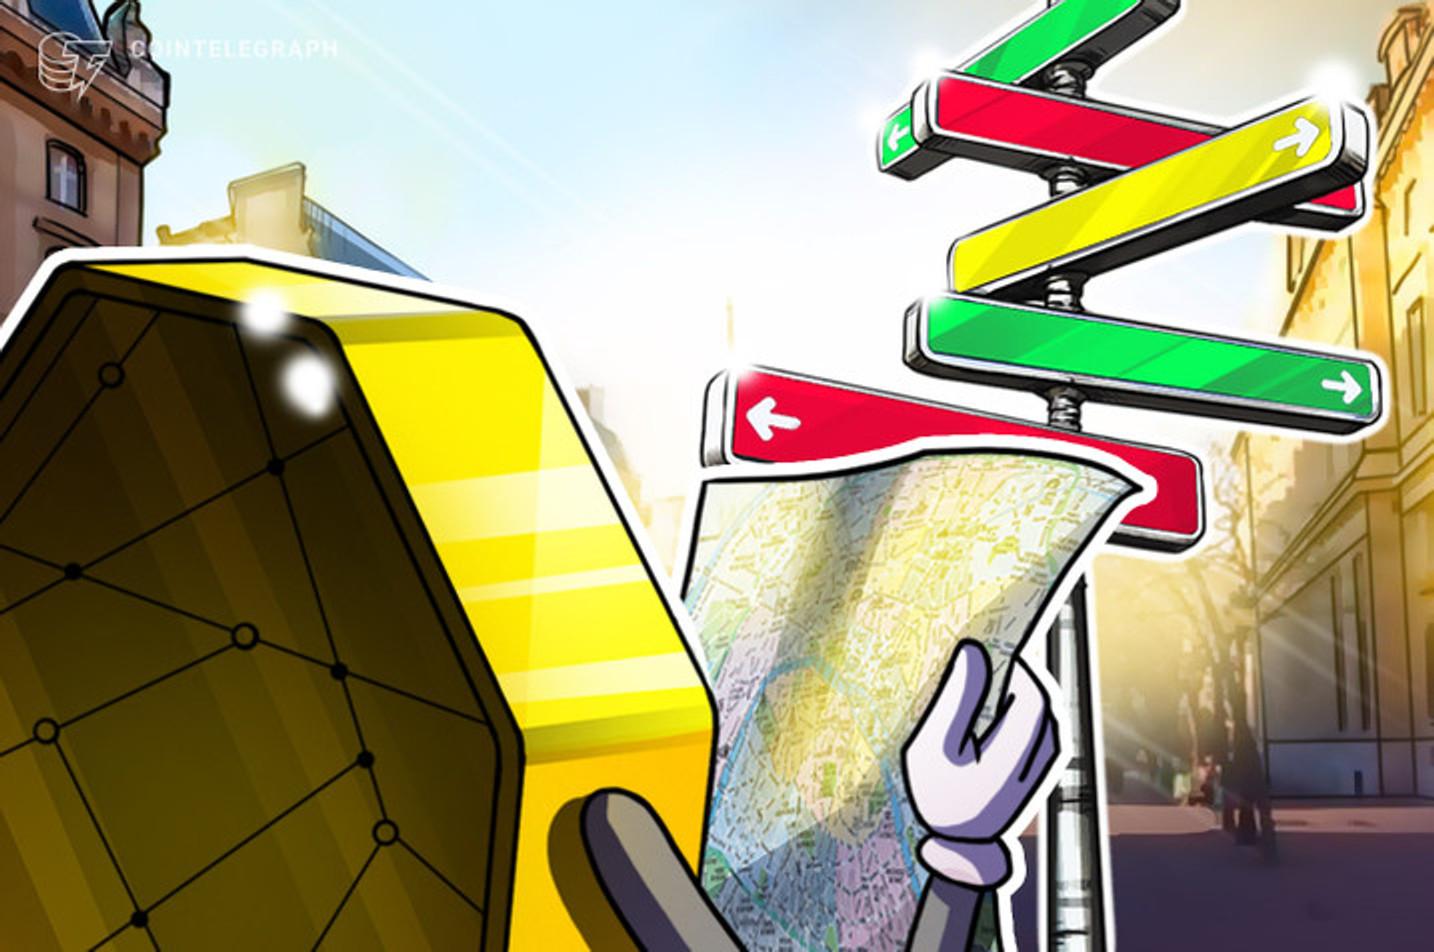 Como o mercado reagiu ao desbloqueio de Bitcoins da Grayscale